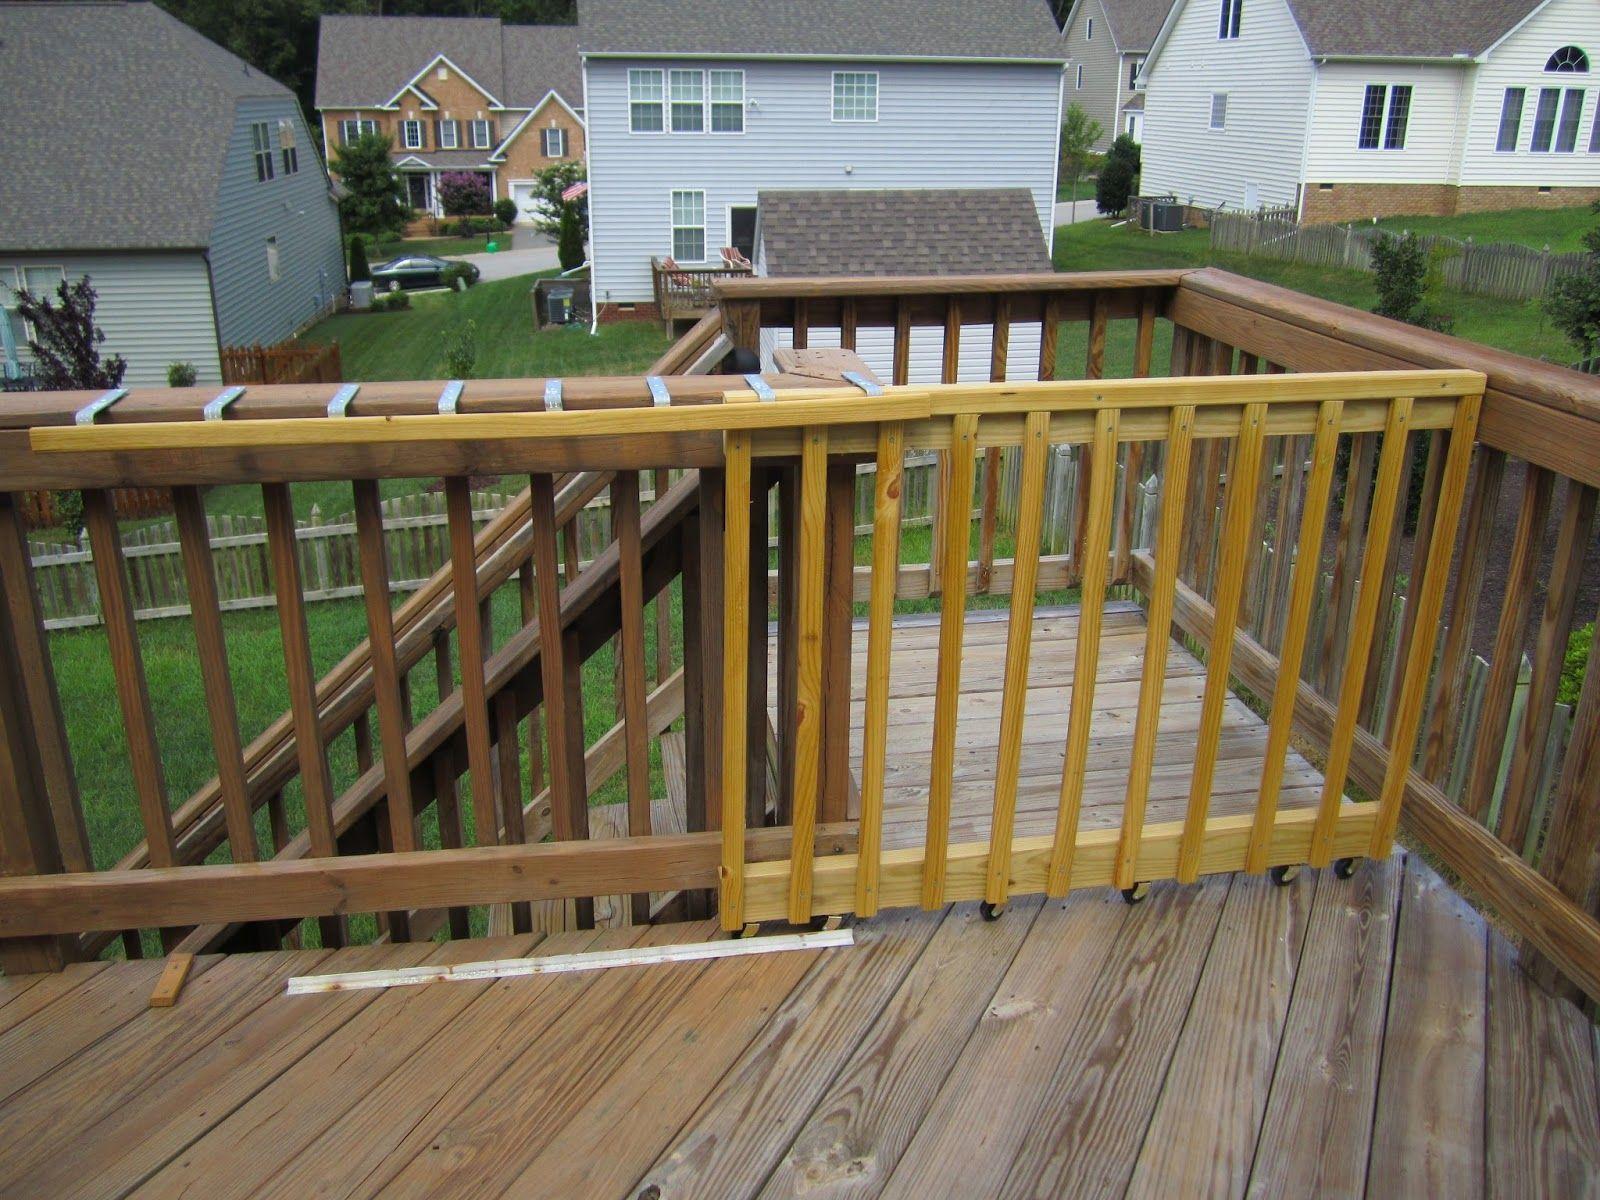 Sliding Deck Gate Deck Gate Sliding Gate Deck Stairs